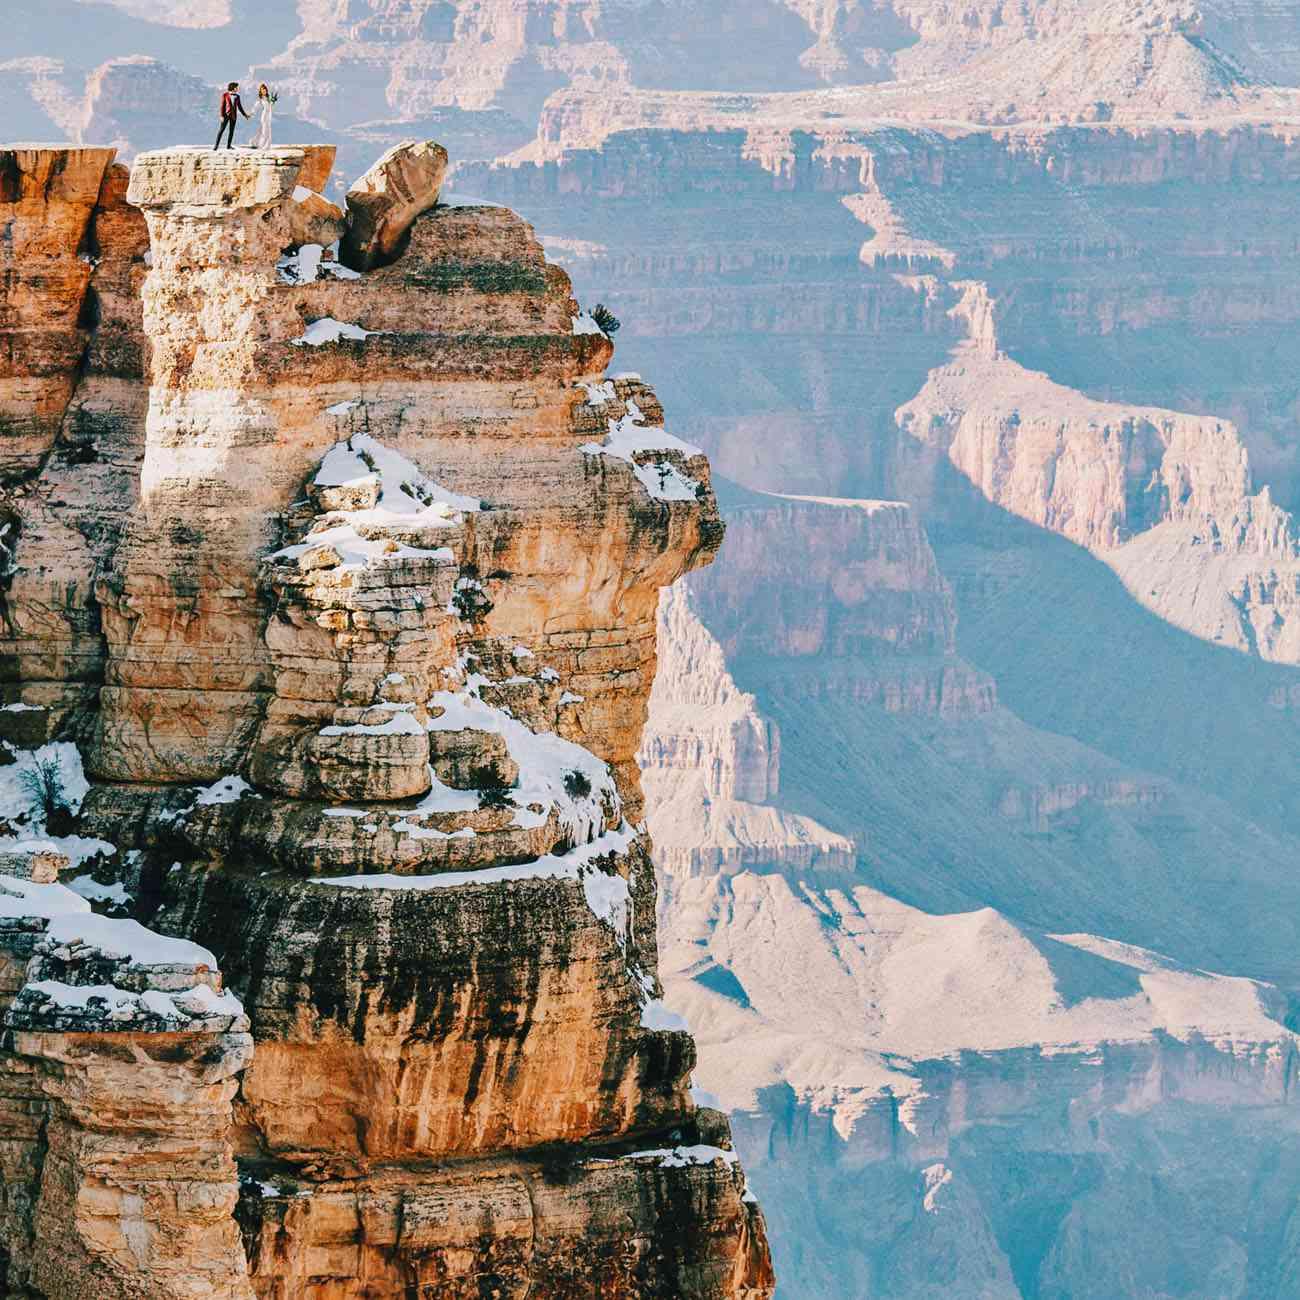 Wedding photo at the Grand Canyon